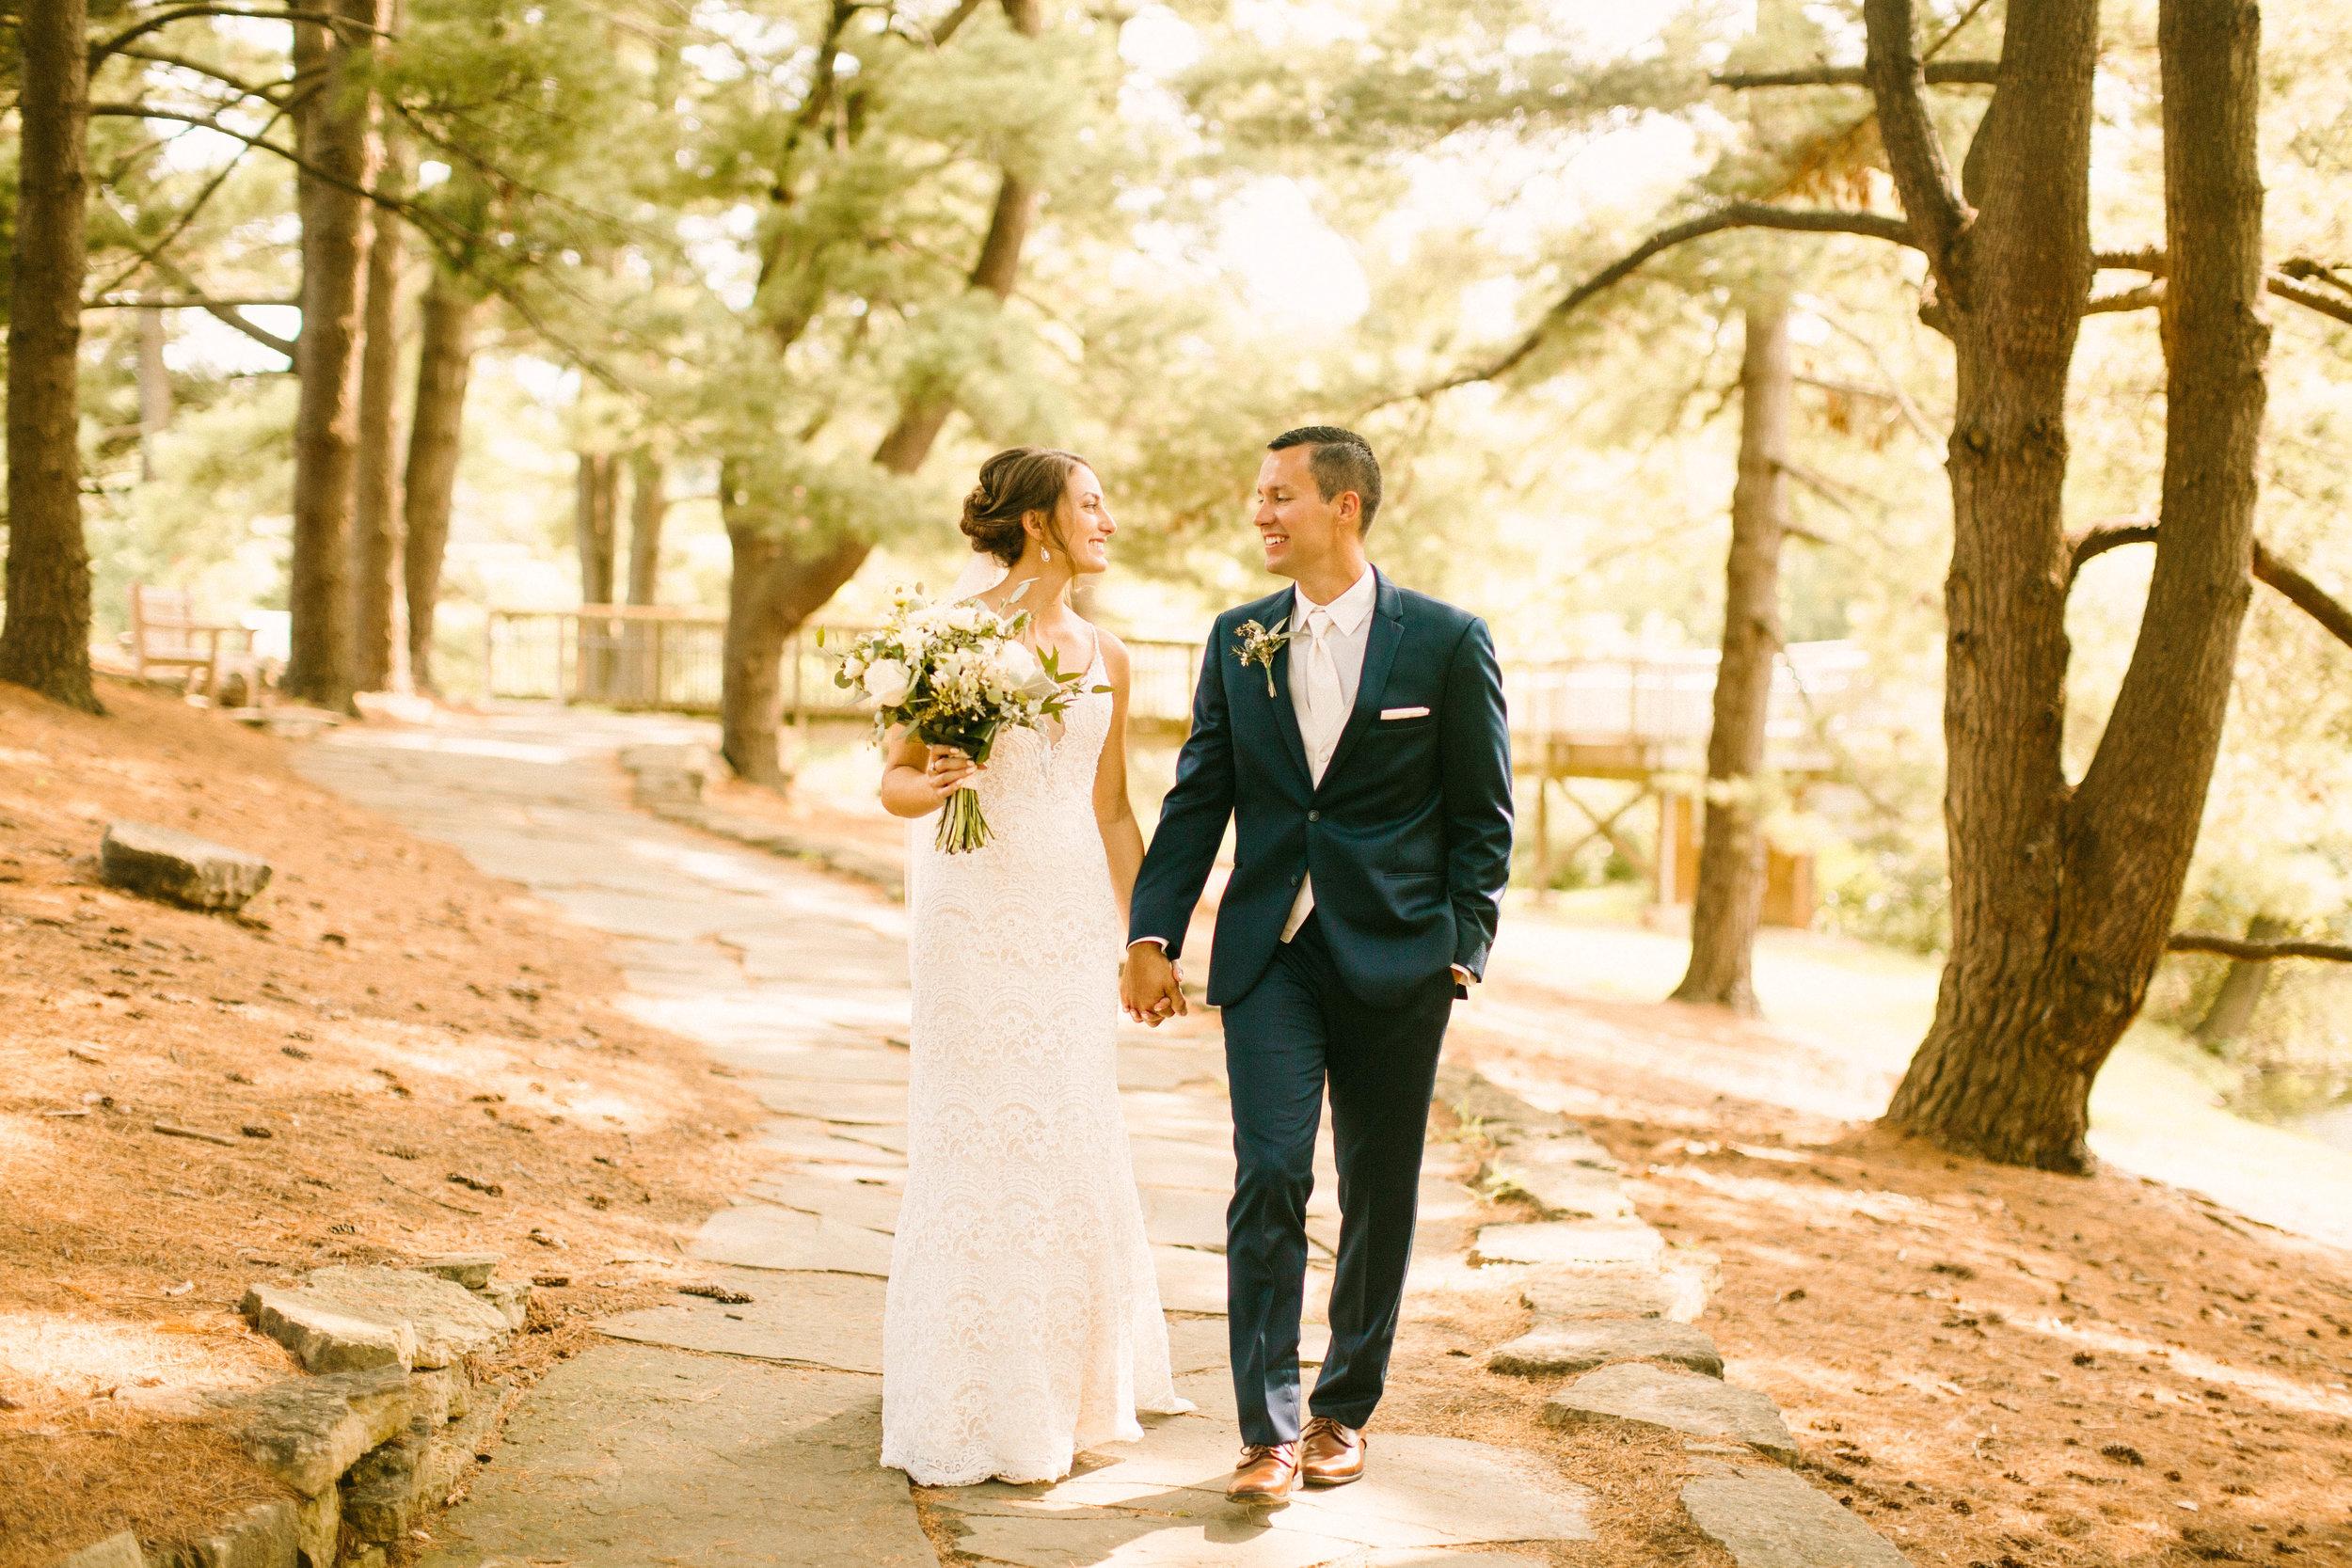 Veronica Young Photography, Summer Wedding inspo